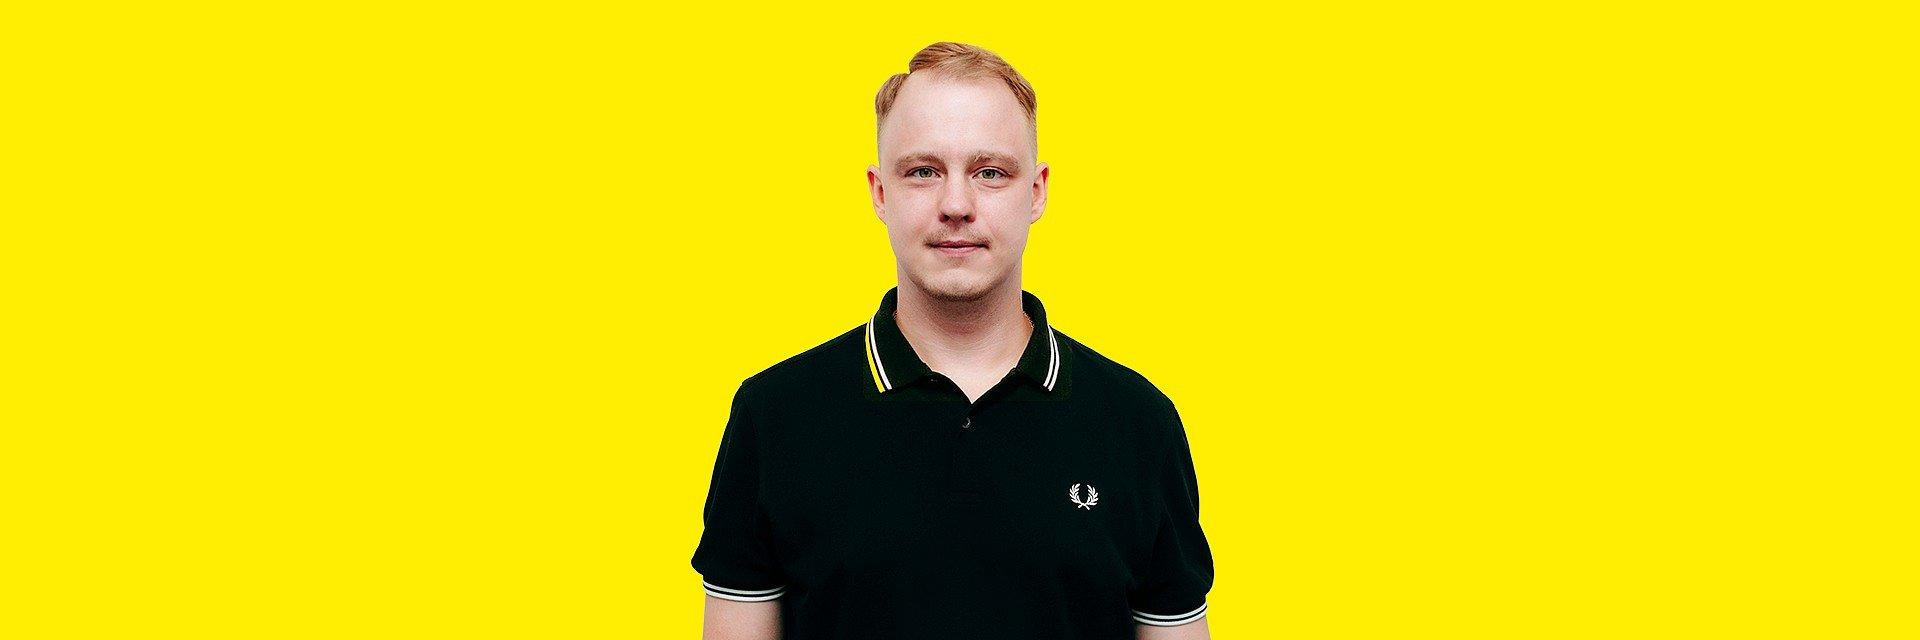 Adam Romaniuk Ecommerce Directorem w Grupie S/F